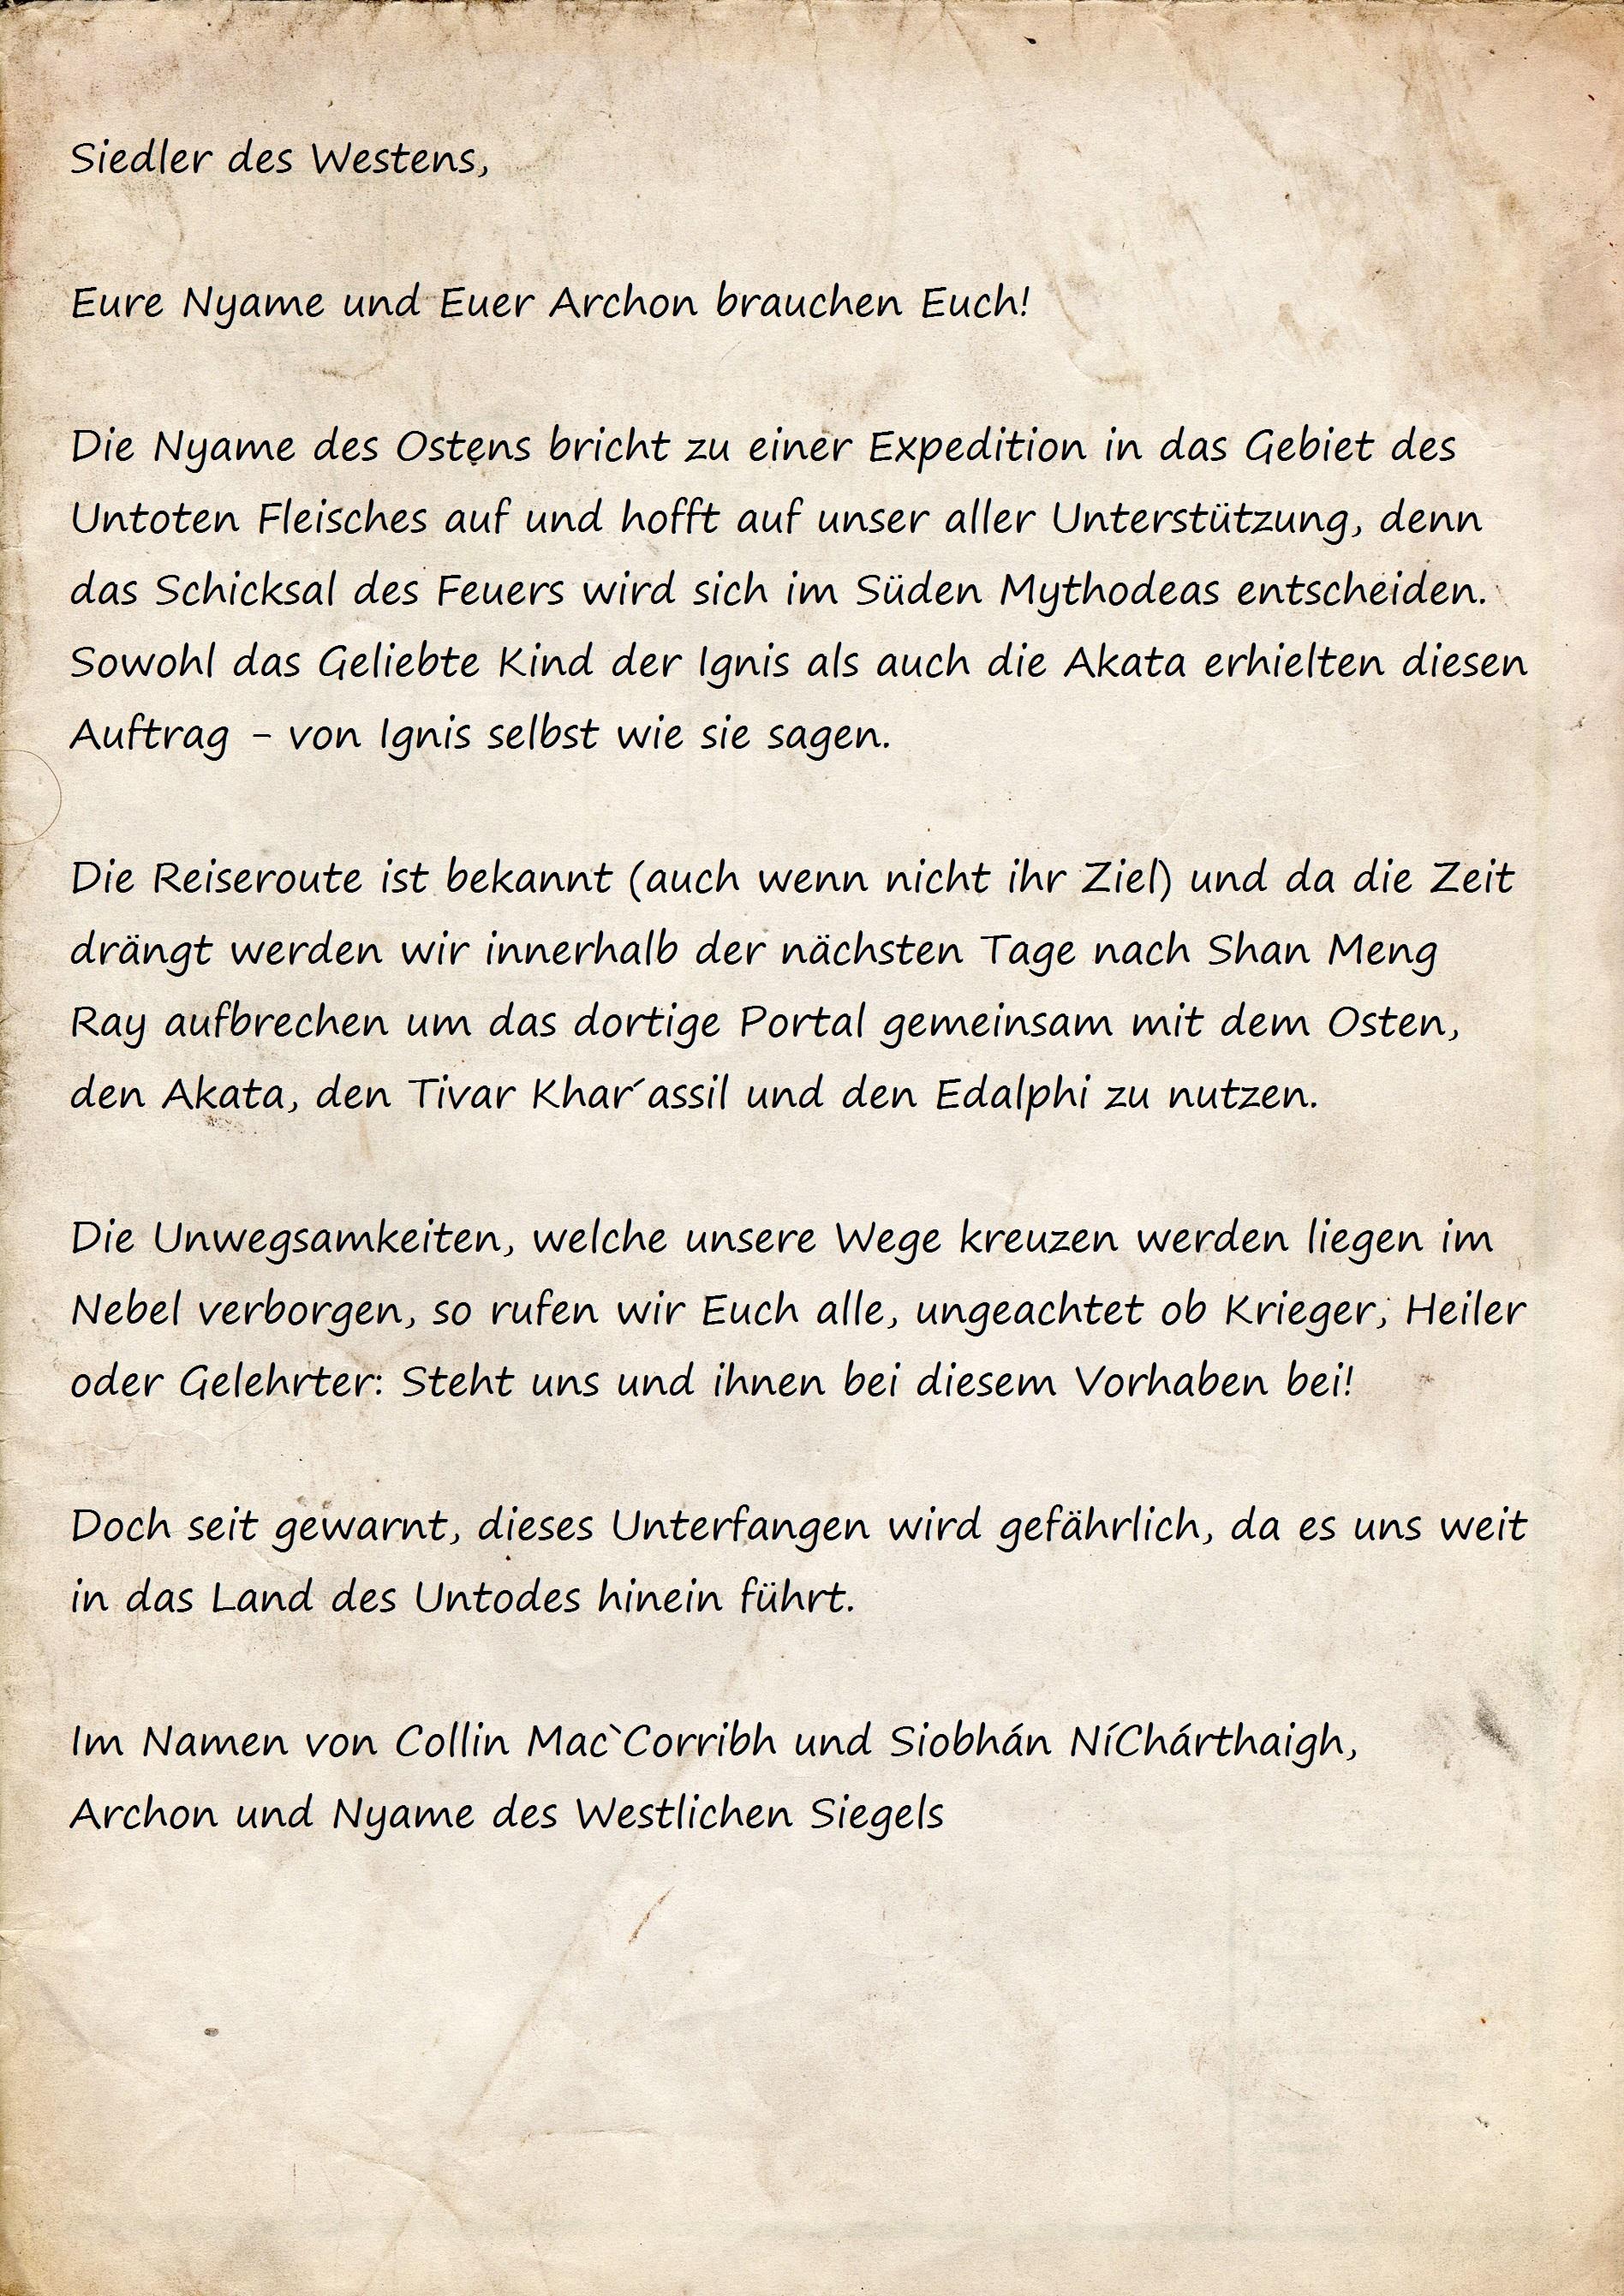 http://www.westliches-siegel.de/files/CvM_Aufruf_De.jpg